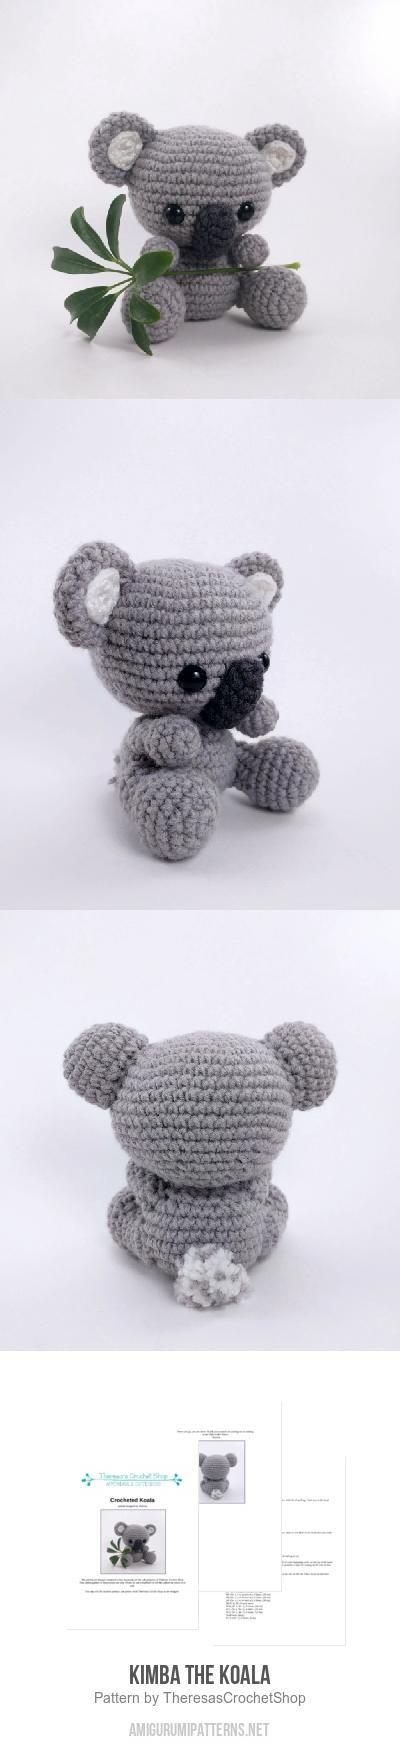 Kimba the Koala amigurumi pattern by Theresas Crochet Shop | Tejido ...